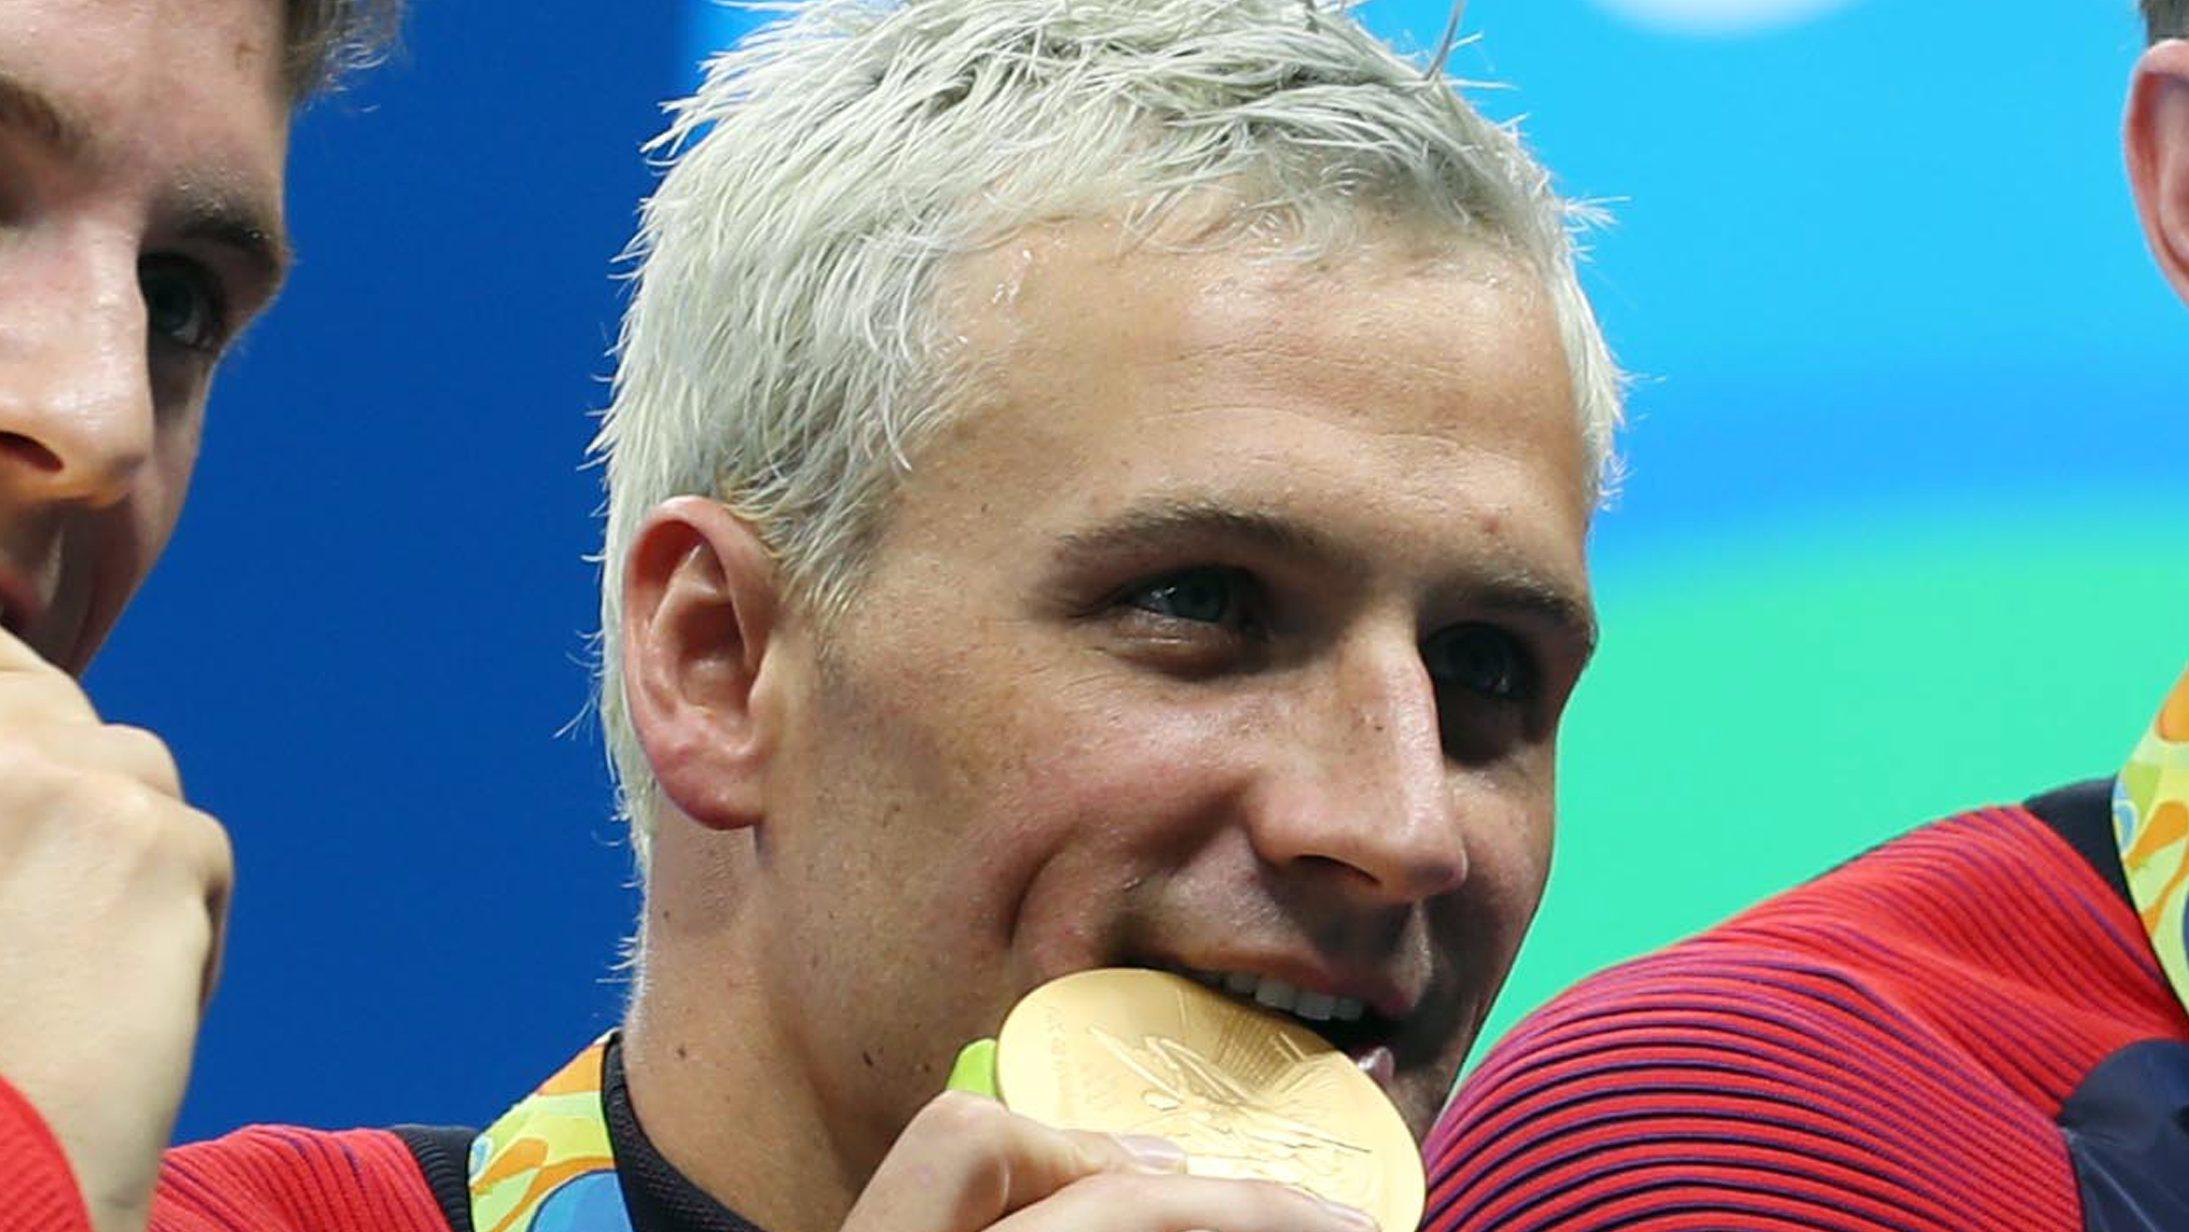 Ryan-Lochte-Rio-Olympics